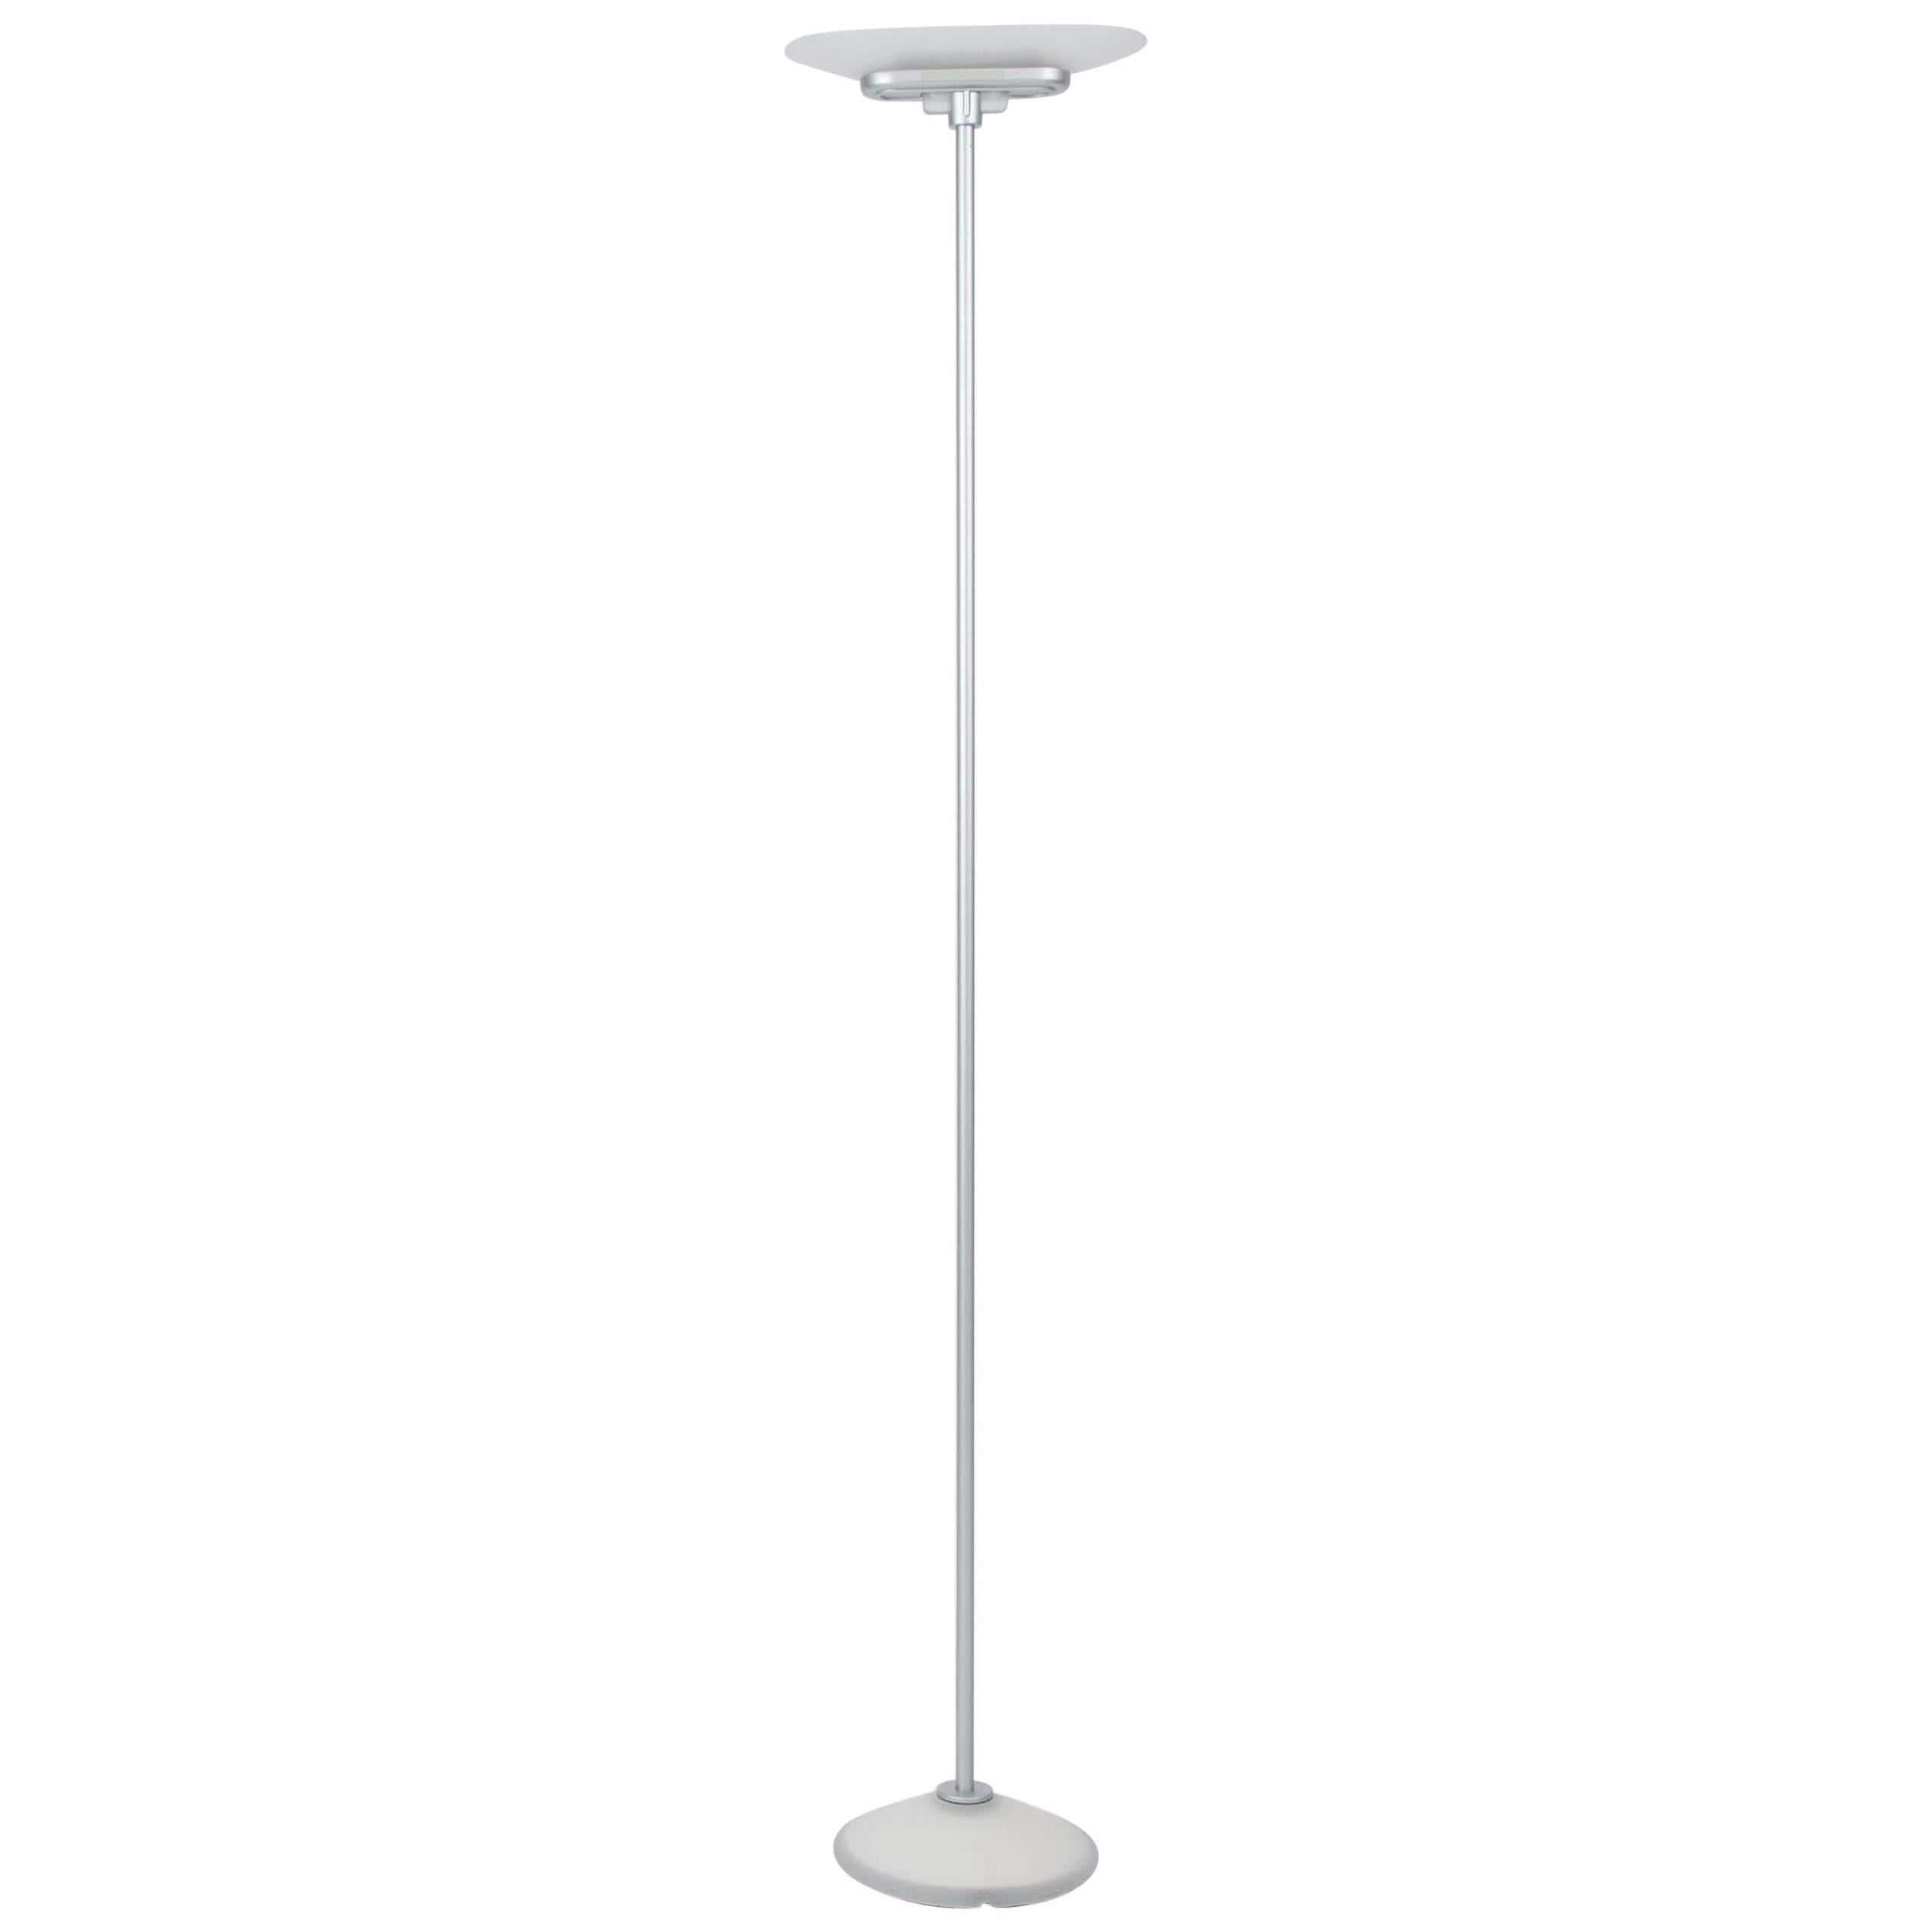 Jill Floor Lamp by Perry King, Santiago Miranda, Gianluigi Arnaldi for Arteluce